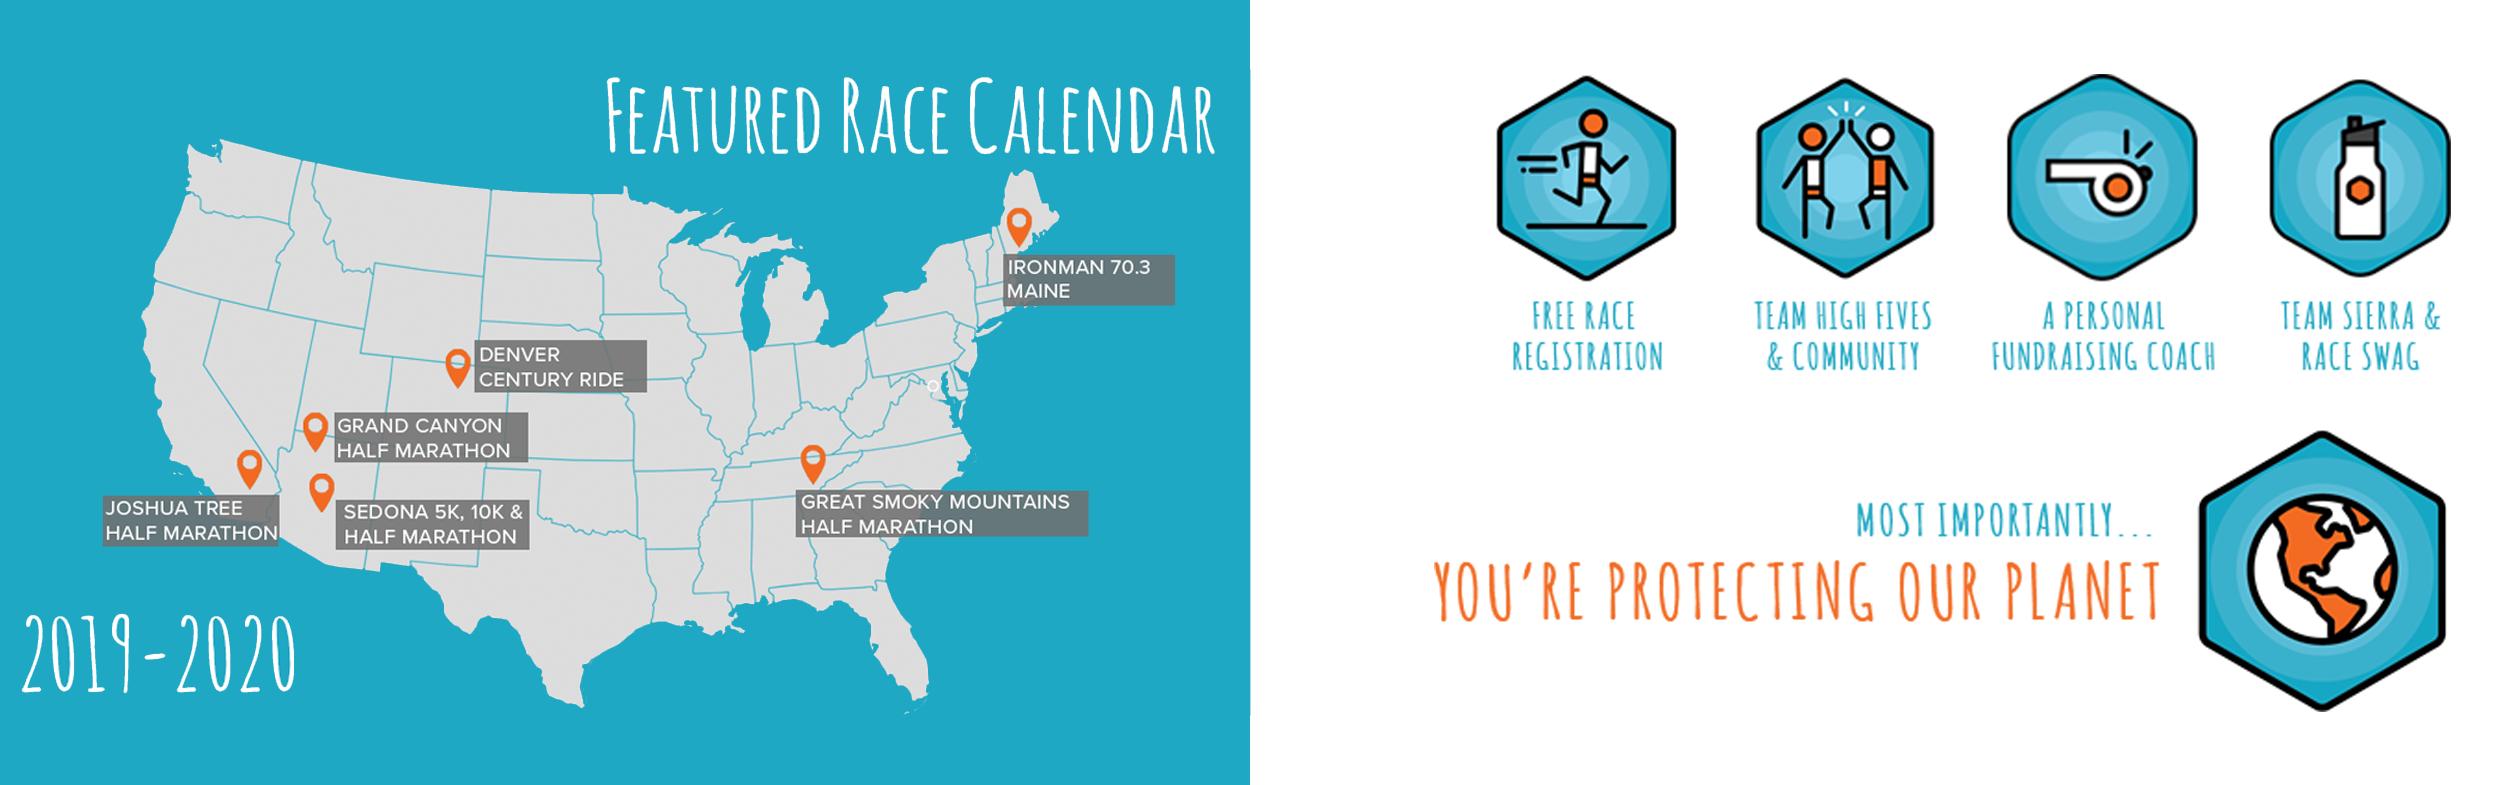 Race Calendar.Team Sierra Race Calendar My Finish Line